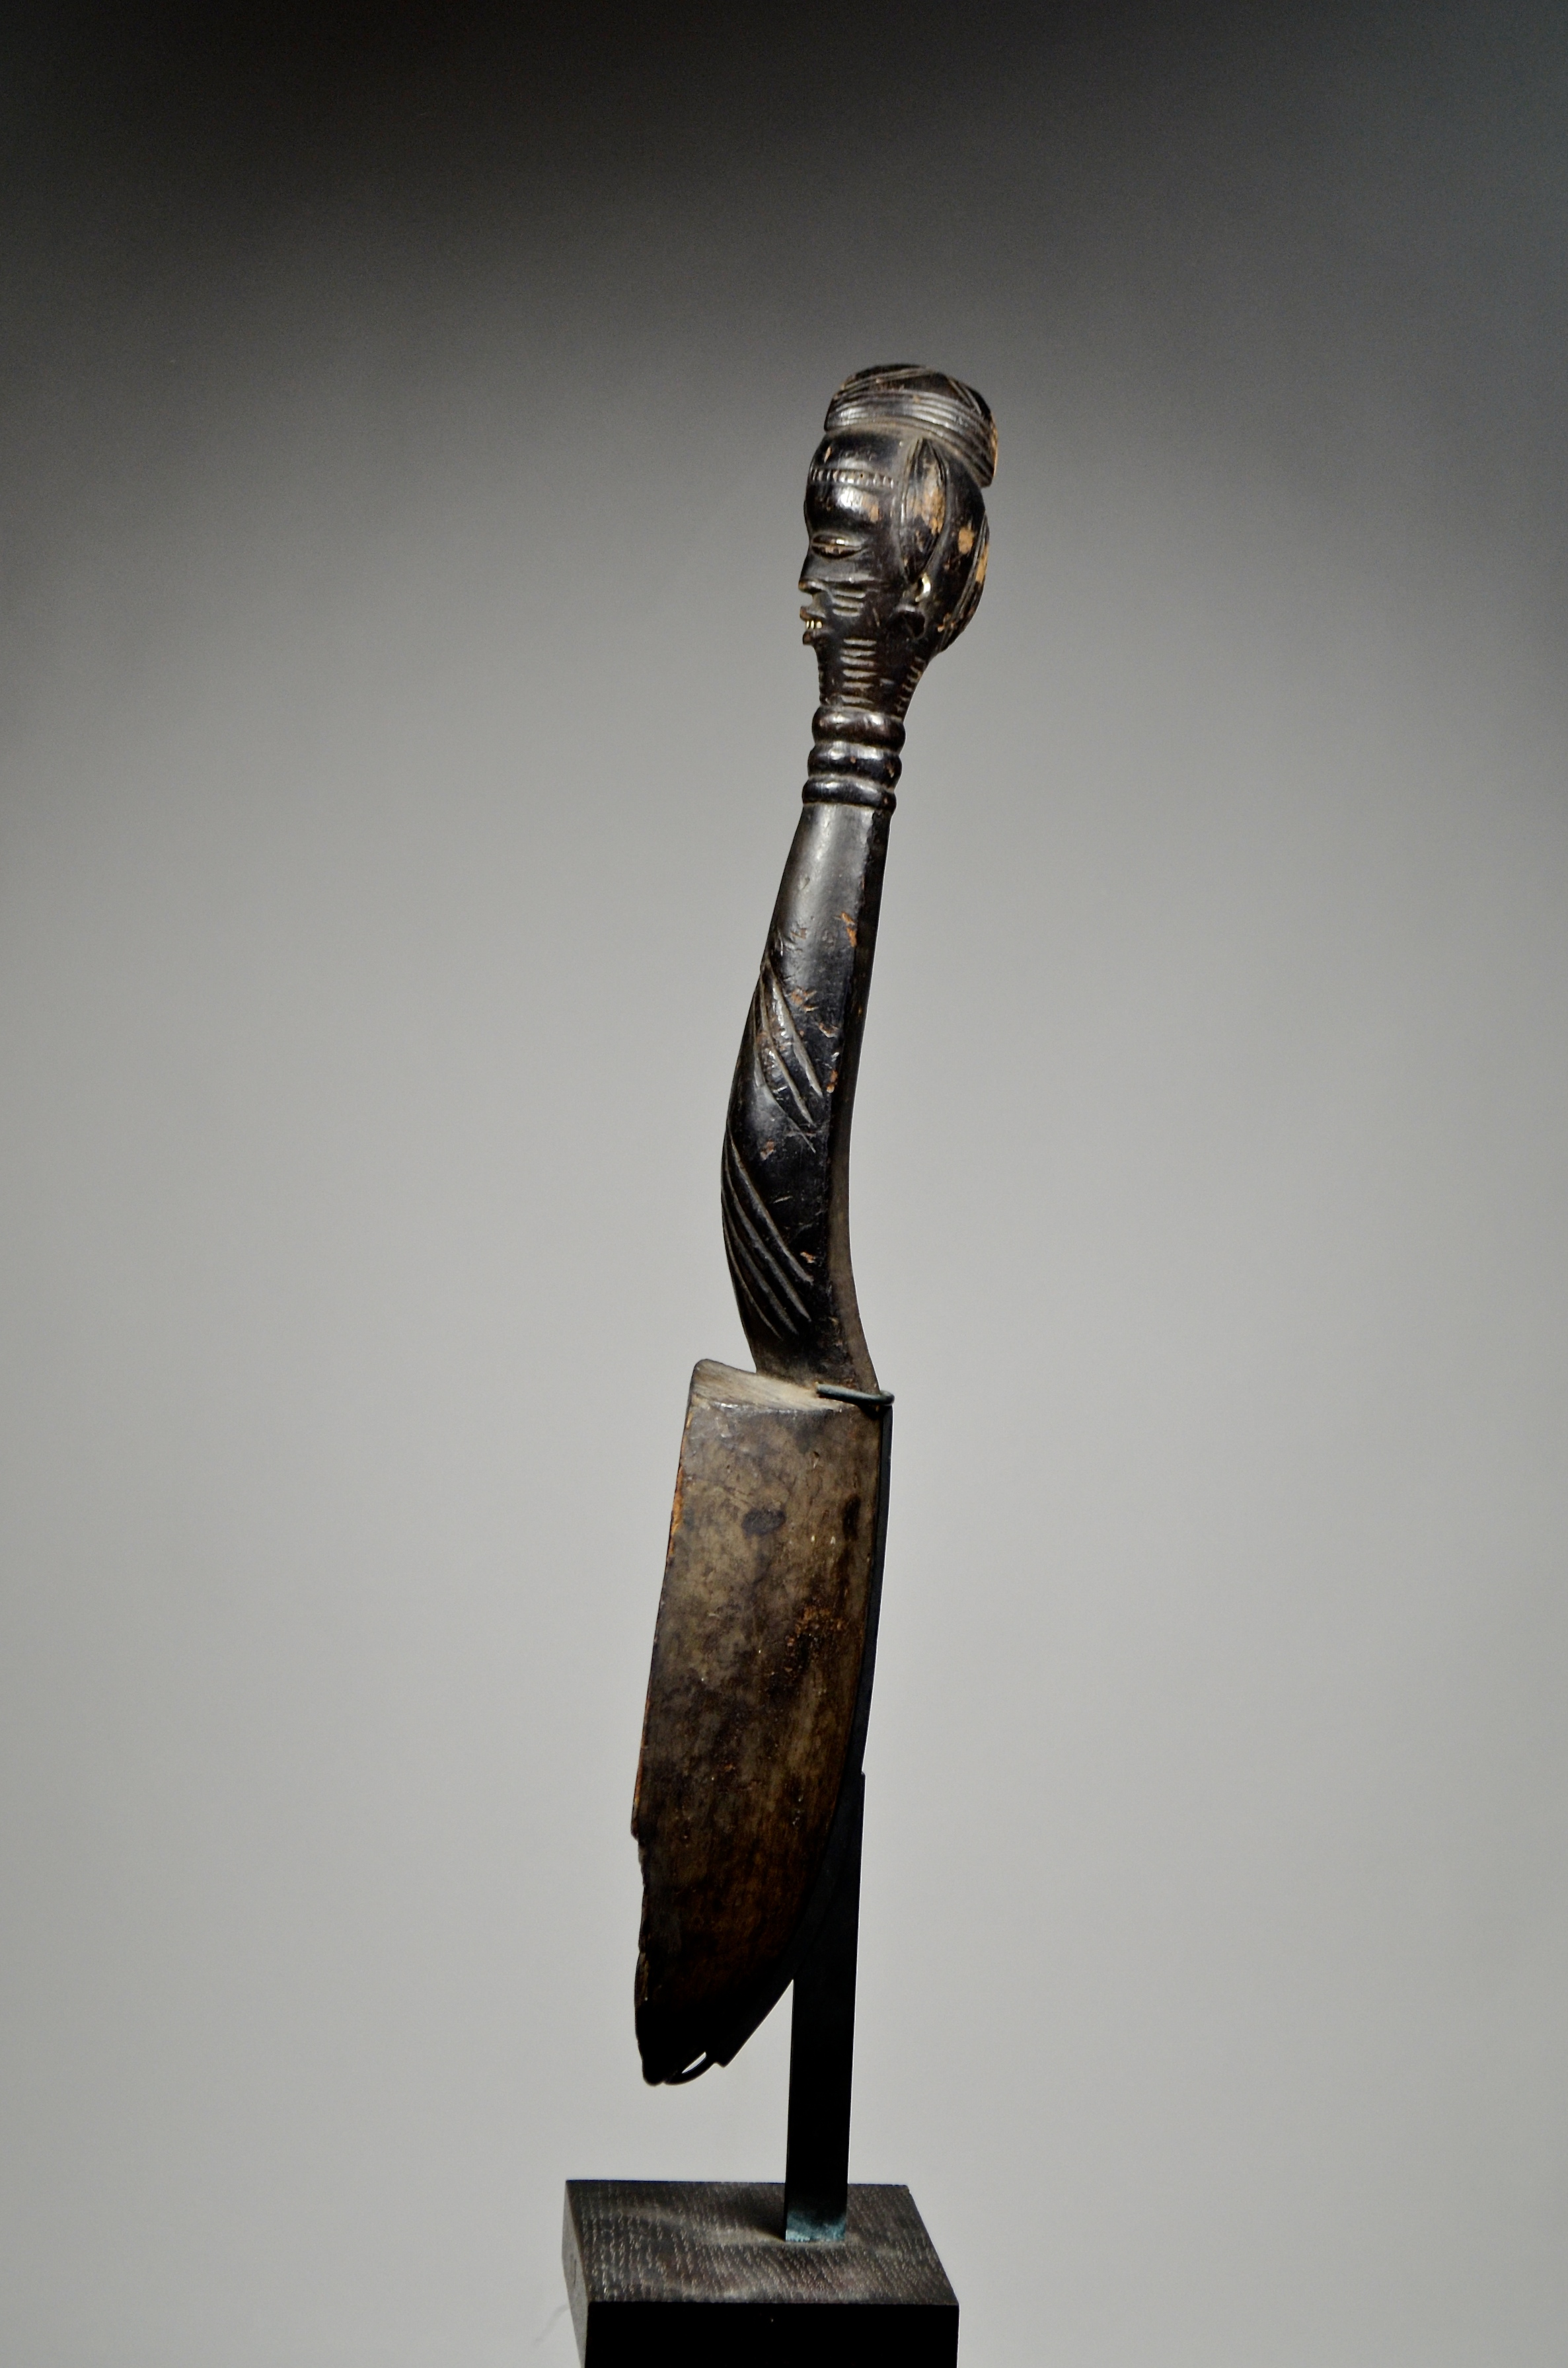 Dan figurative ladle